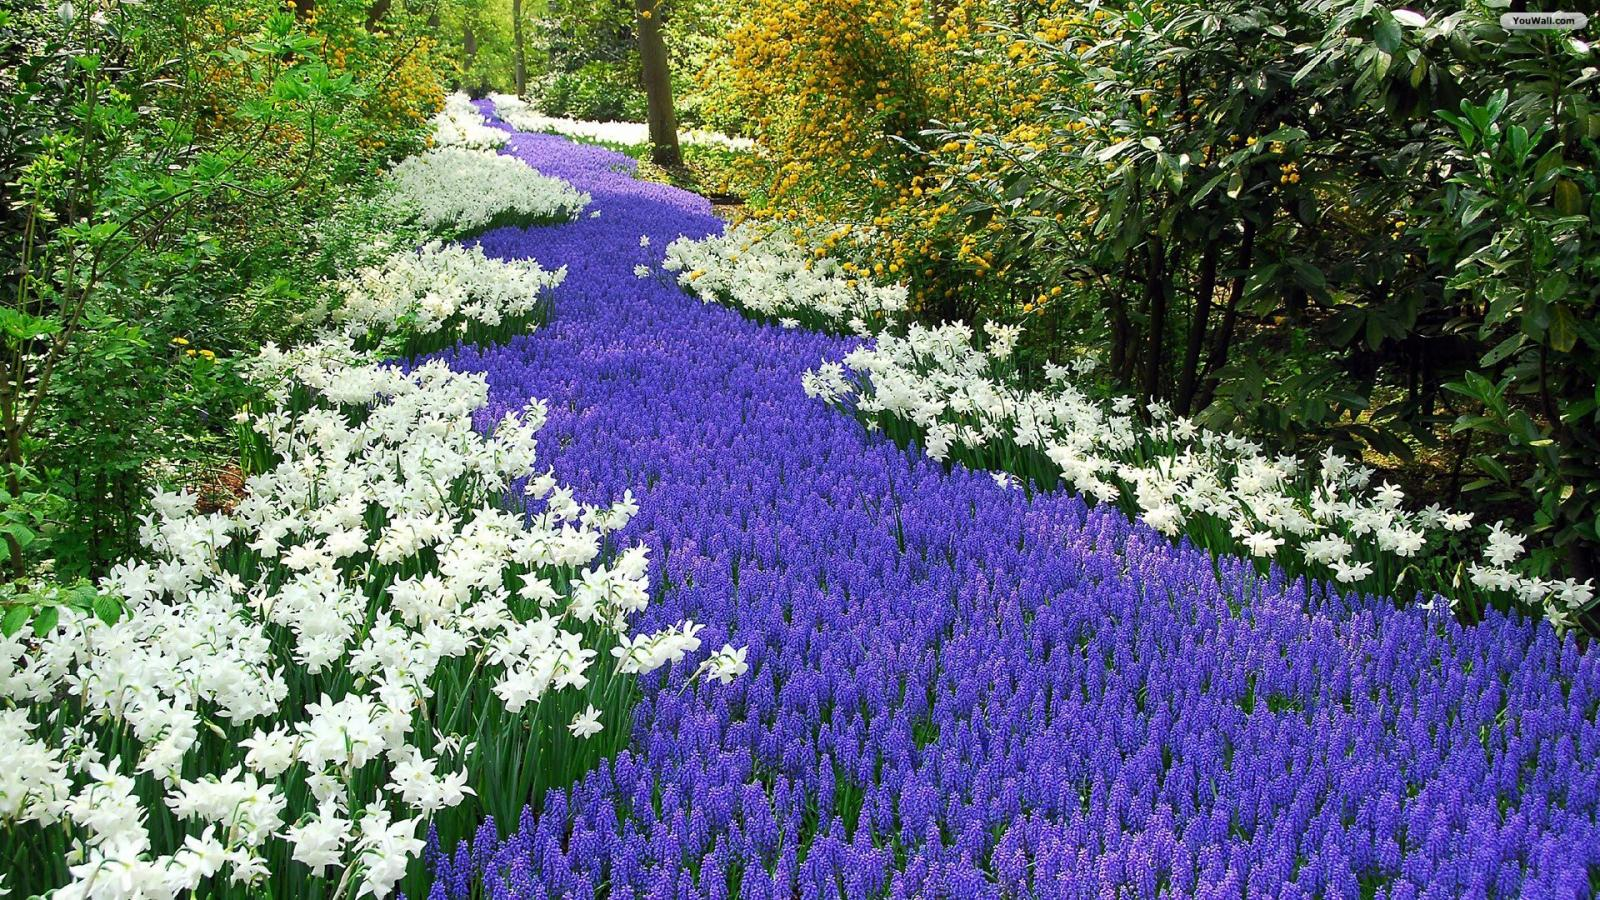 Beautiful Flower Garden Wallpaper 1600x900 Download Wallpapers Page